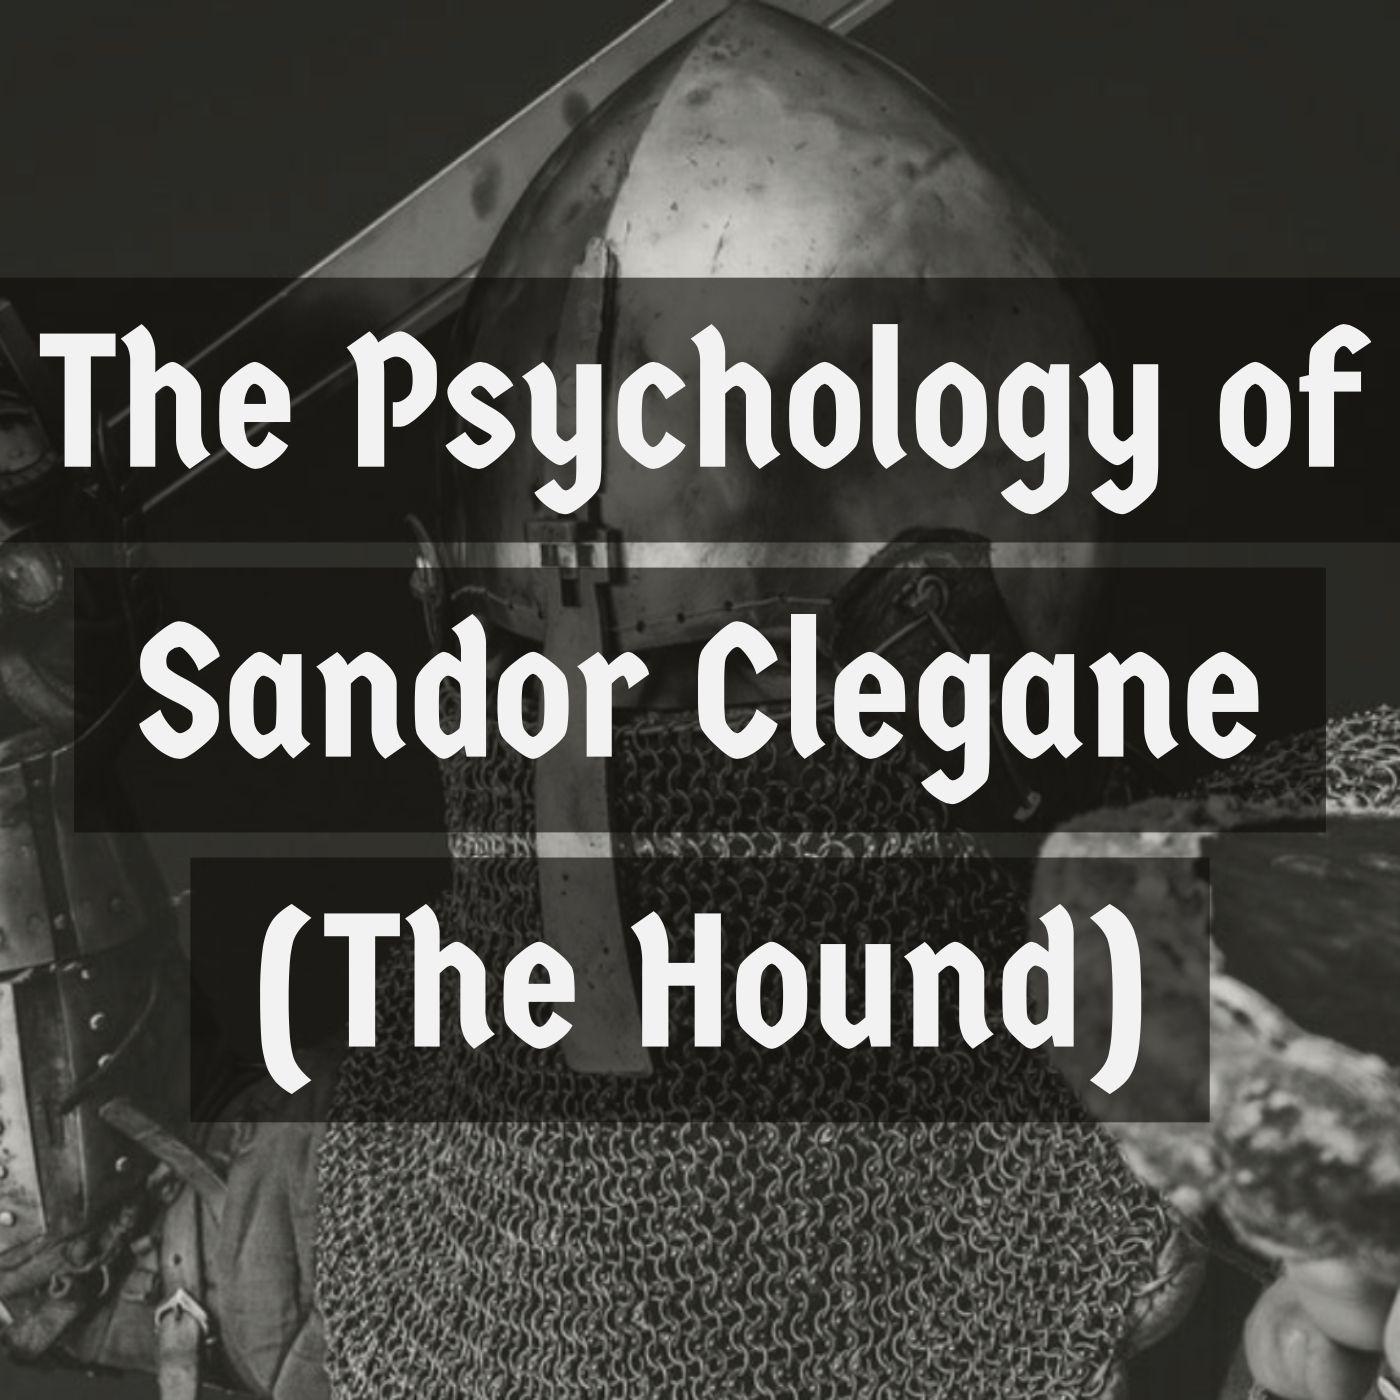 The Psychology of Sandor Clegane (2017 Rerun)